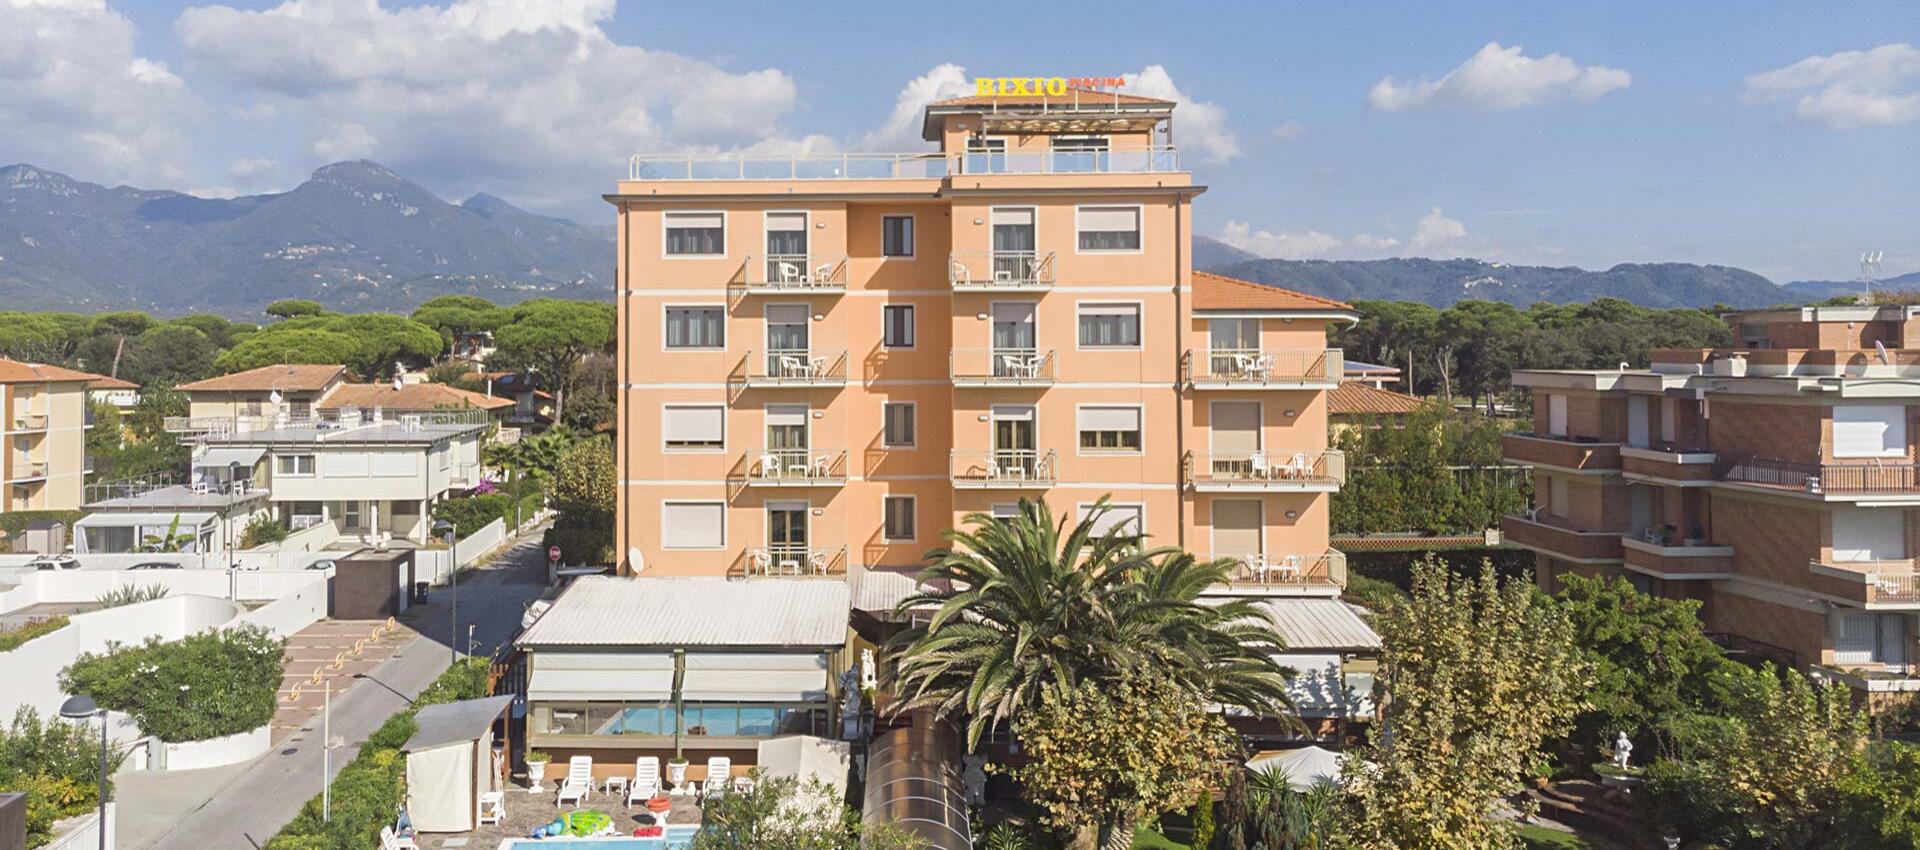 hotelbixio it home 009